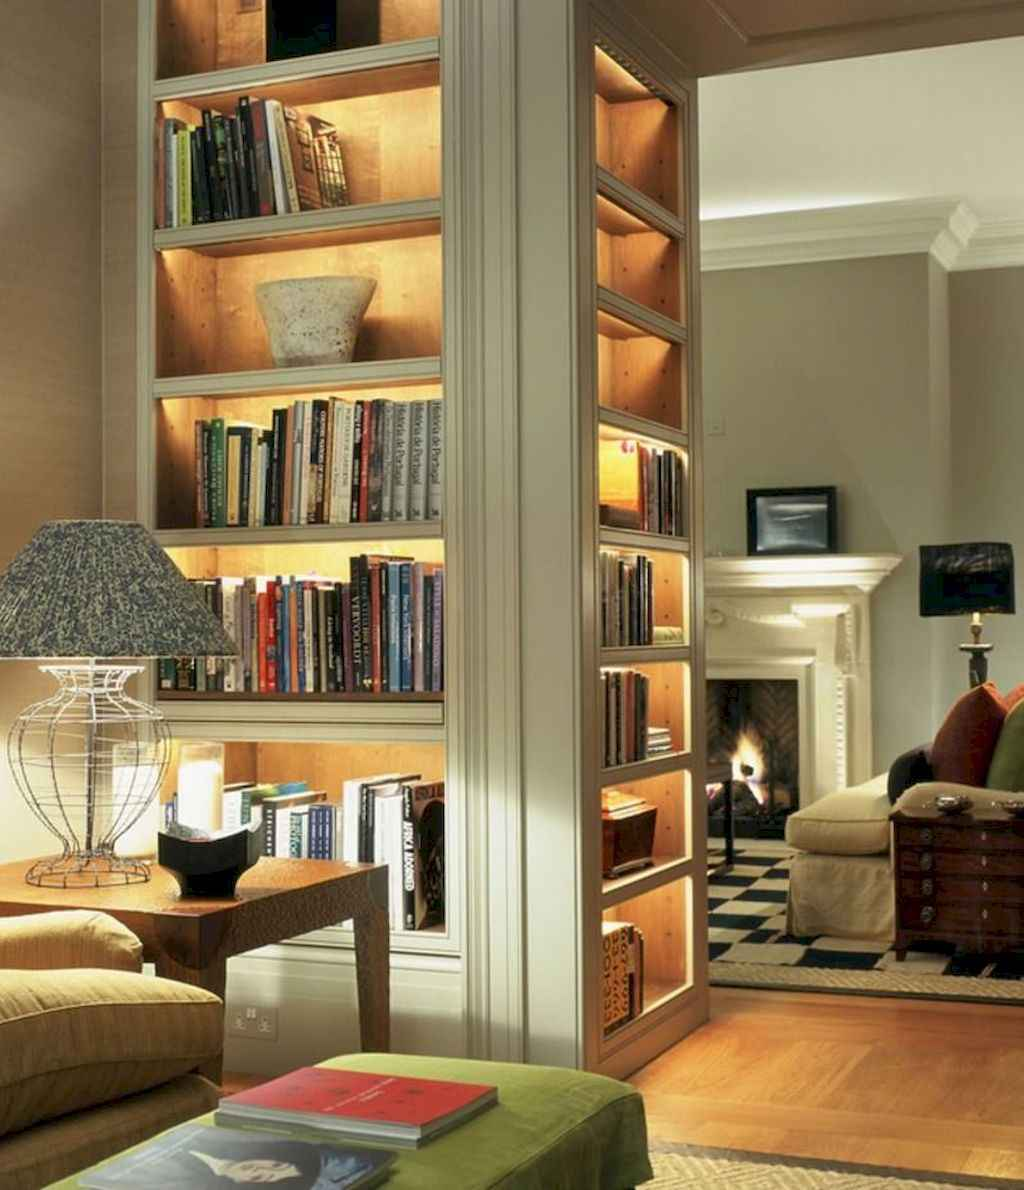 Minimalist diy room decor ideas that fit small room (2)